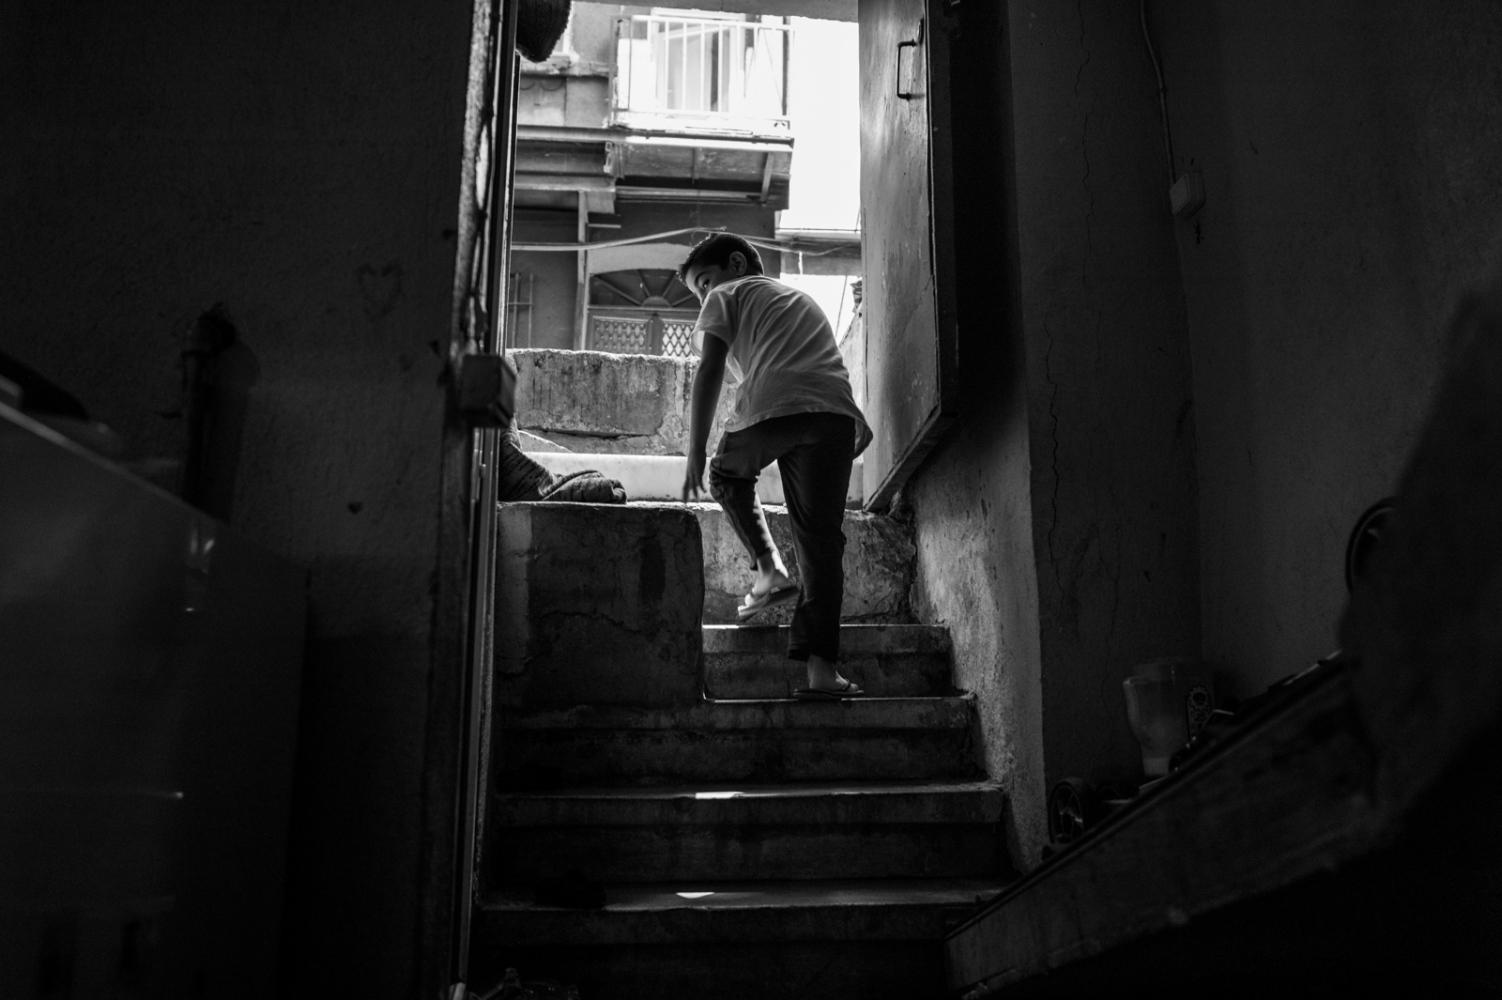 Art and Documentary Photography - Loading PascalVossen_UUU-13.jpg